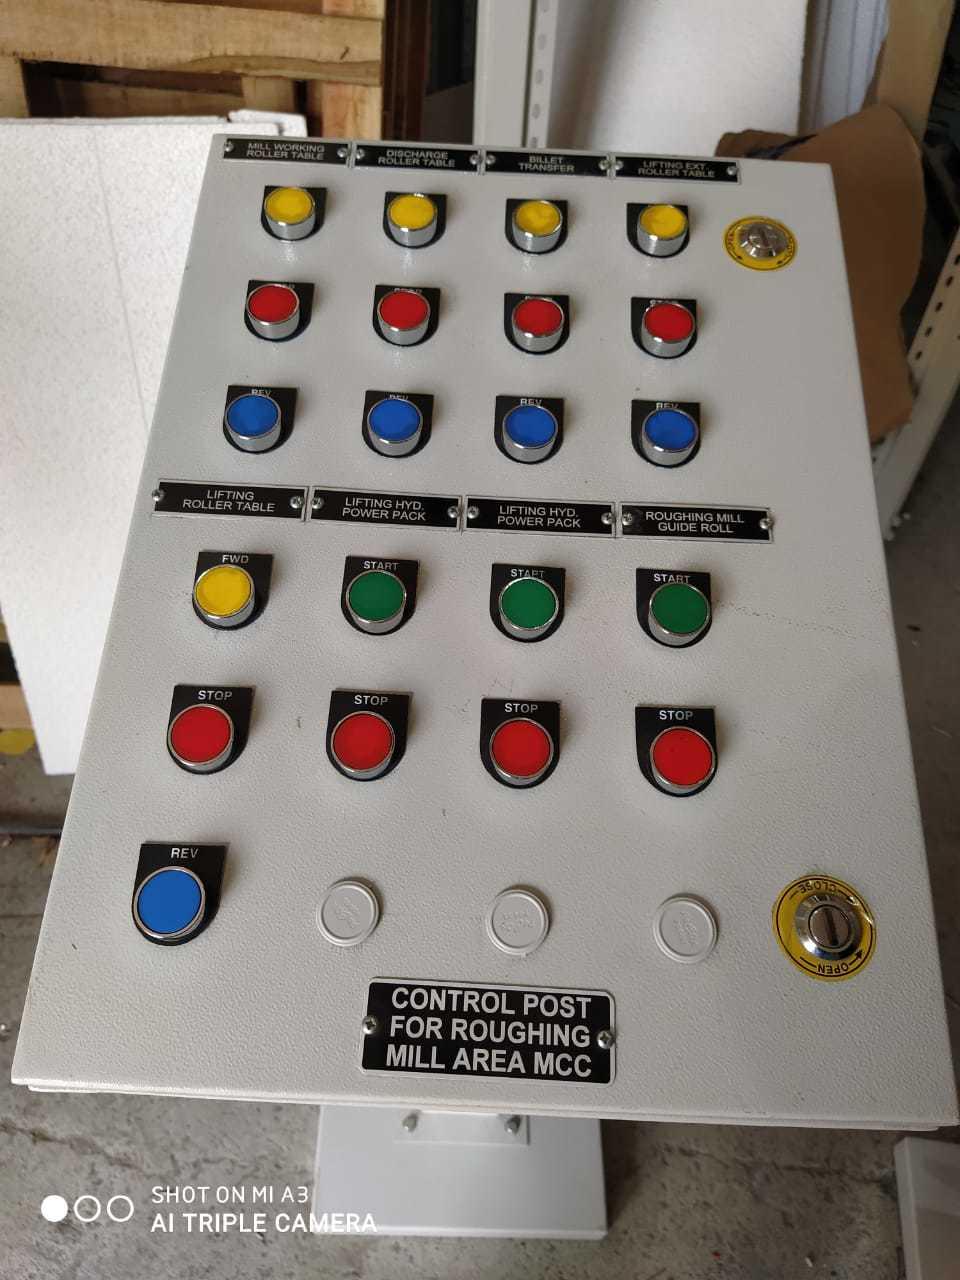 Control Post